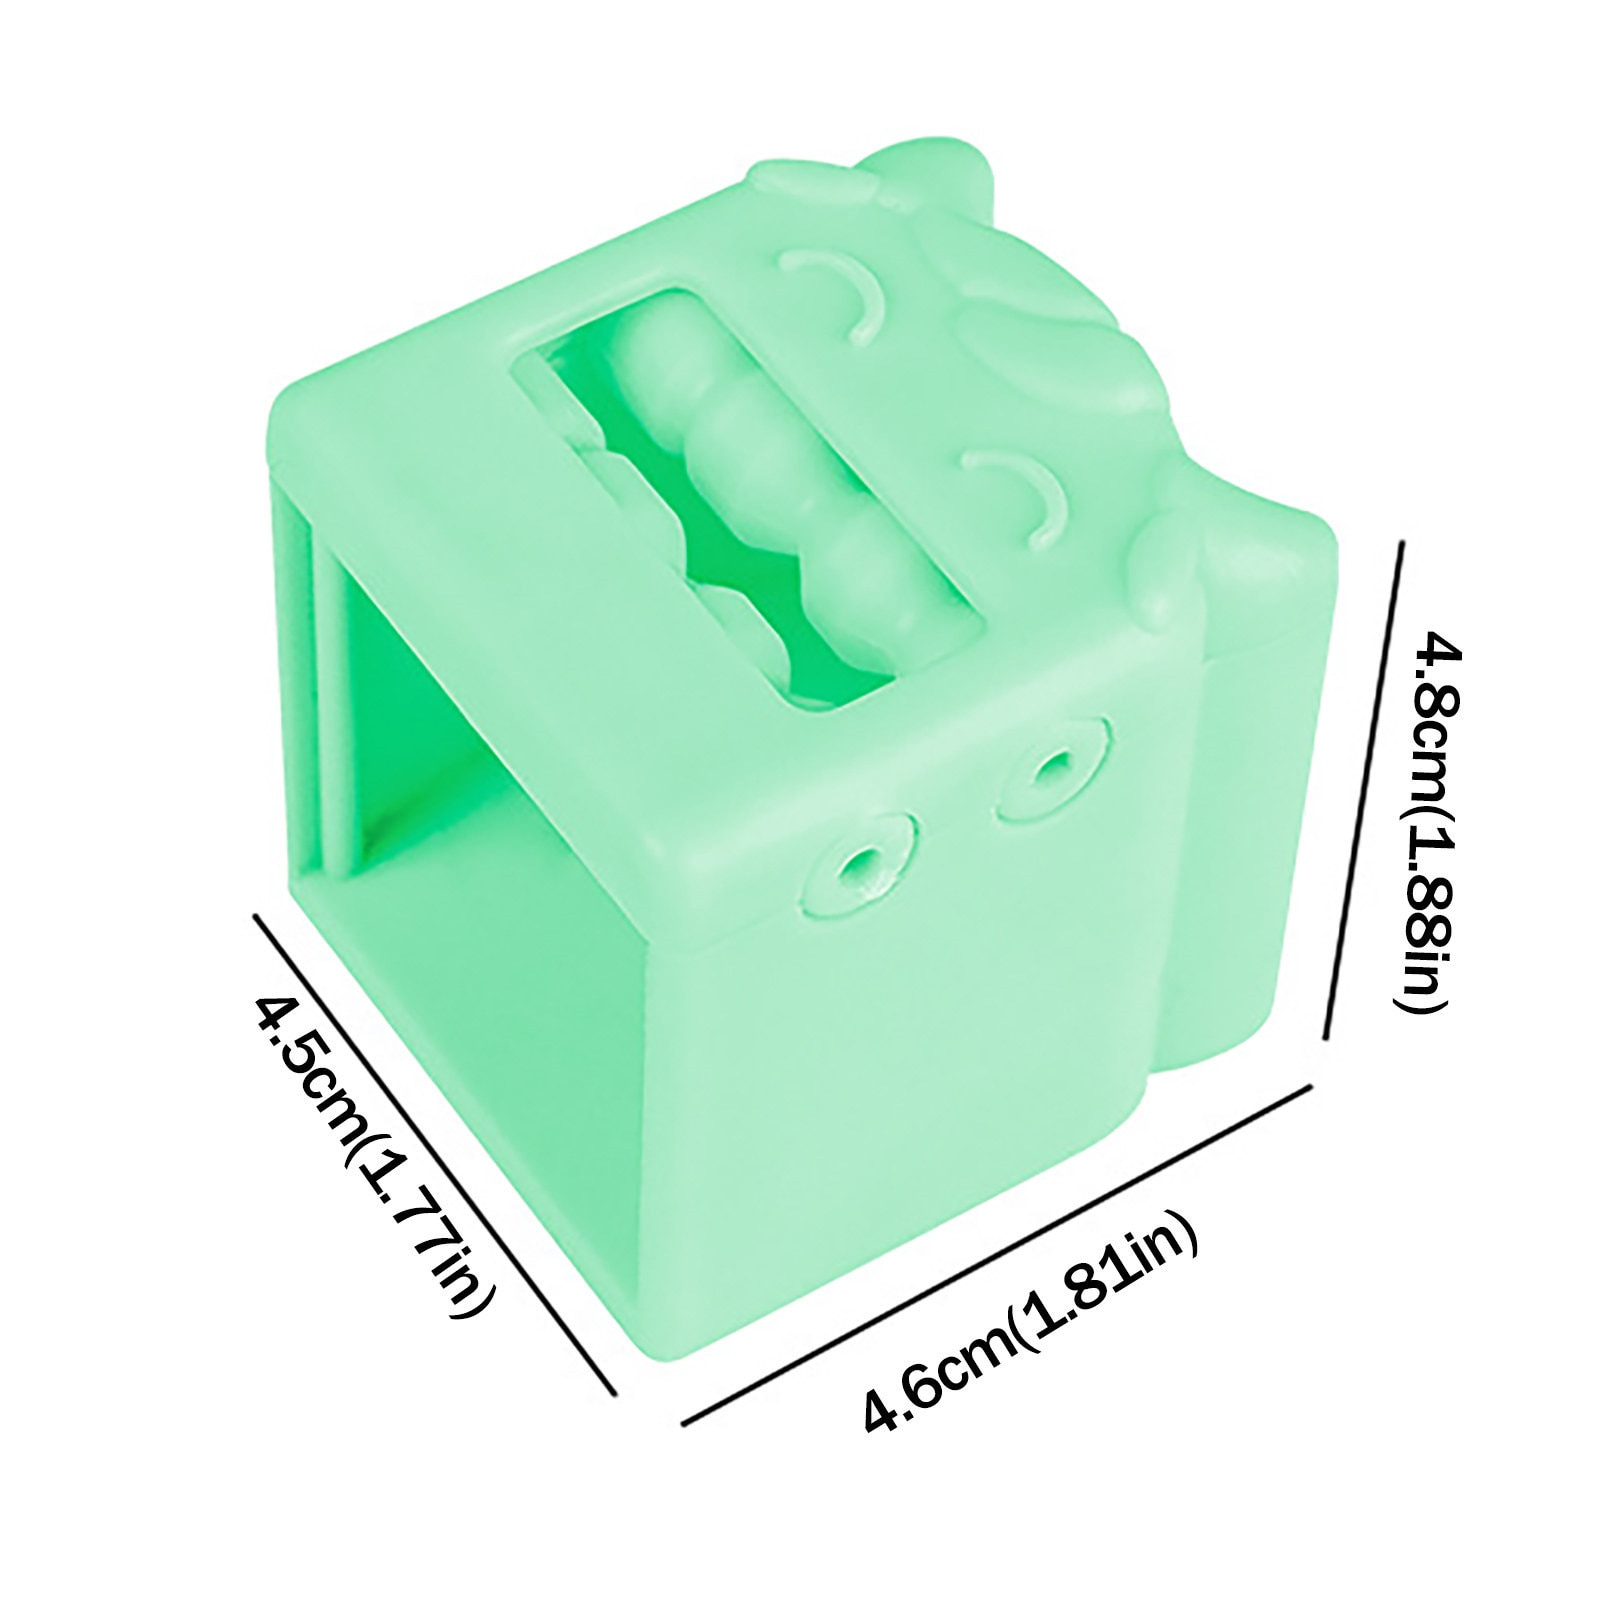 1PC Plastic Melon Seed Peeler Automatic Shelling Machine Convenient Household Kitchen Tool Accessories dodatki do kuchni c1